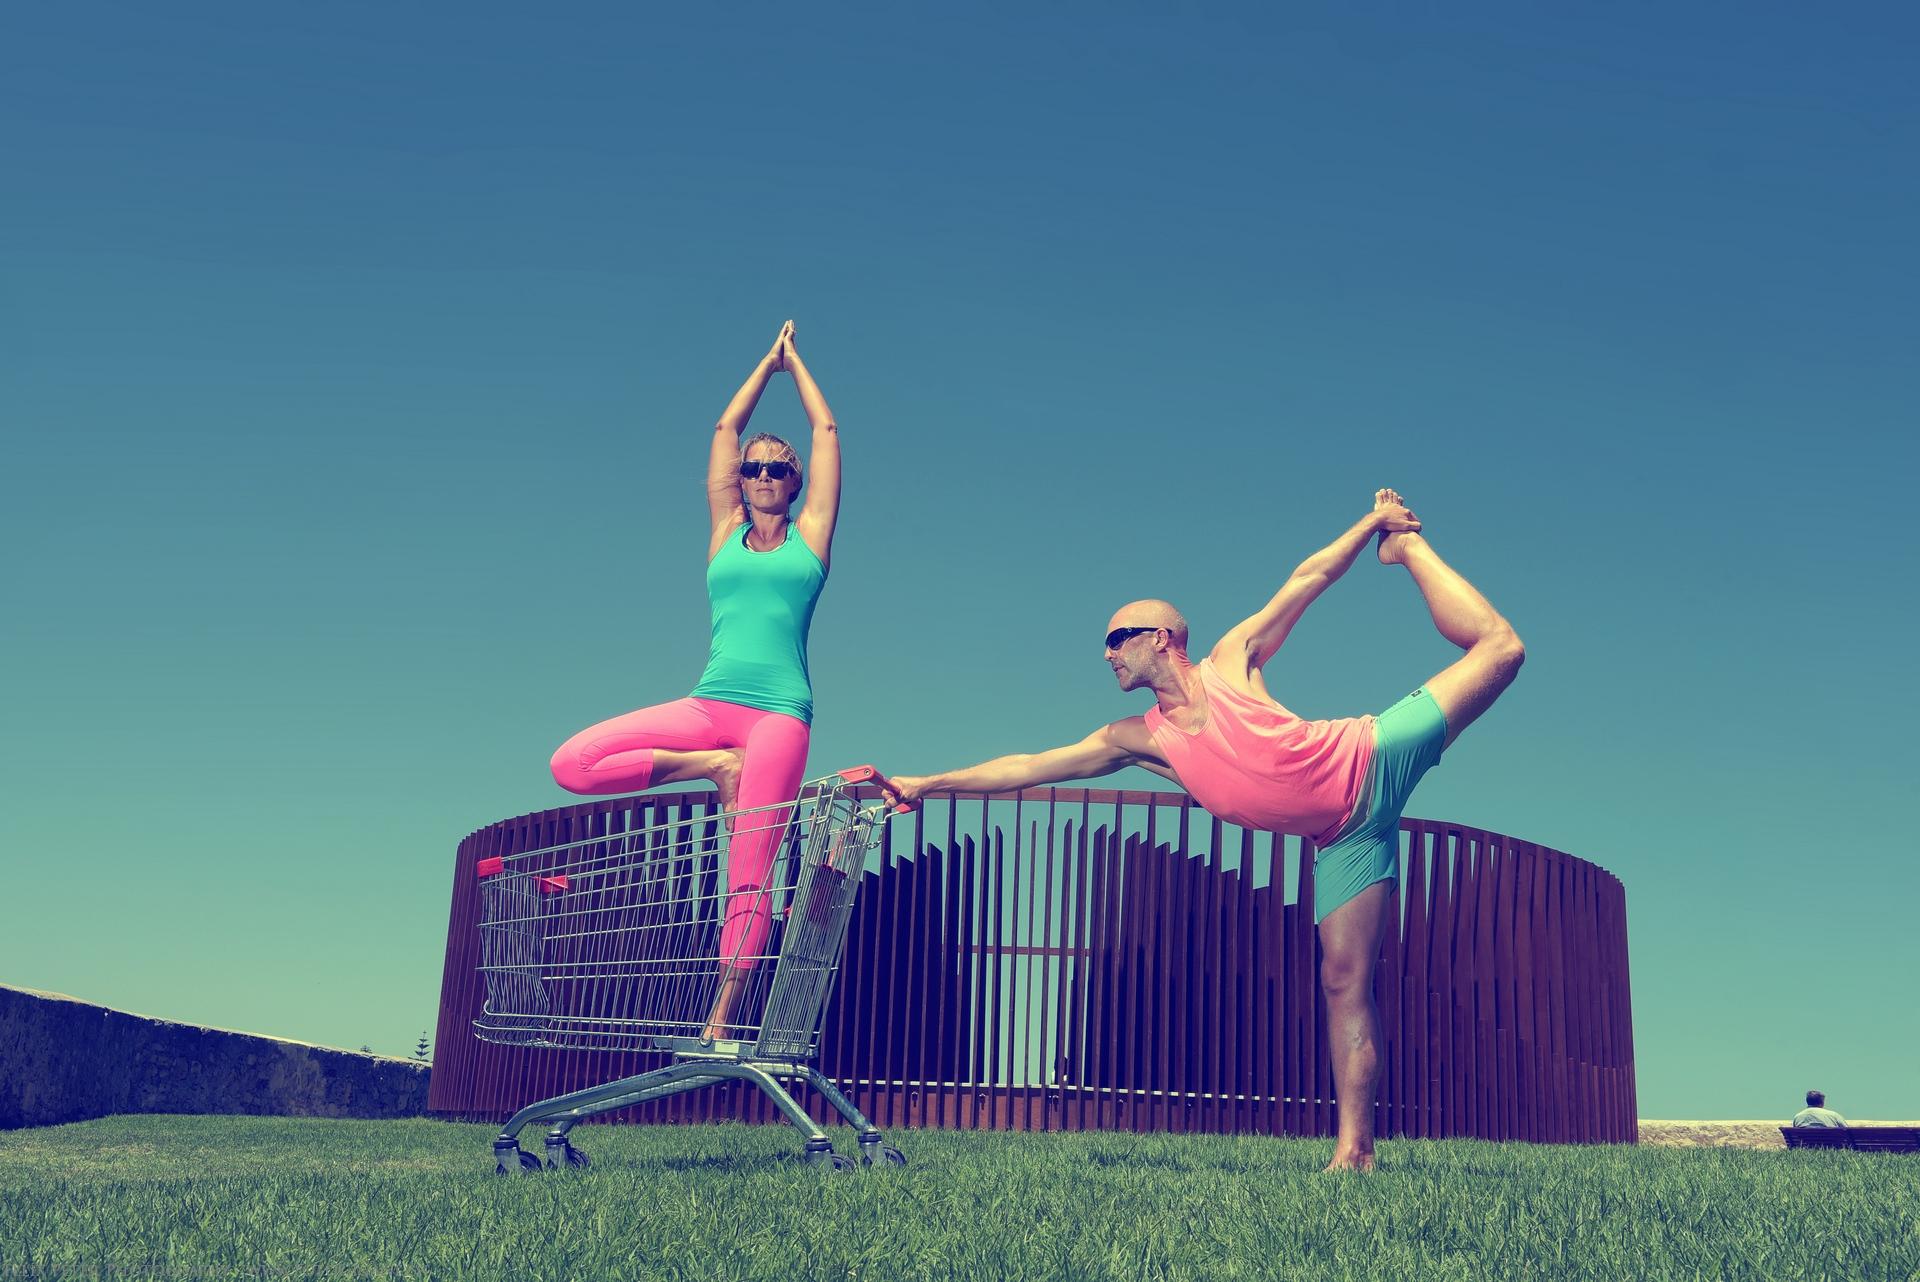 Felix-Peter-Yoga-Pilates-Dance-Fotografie_Bern_129.jpg